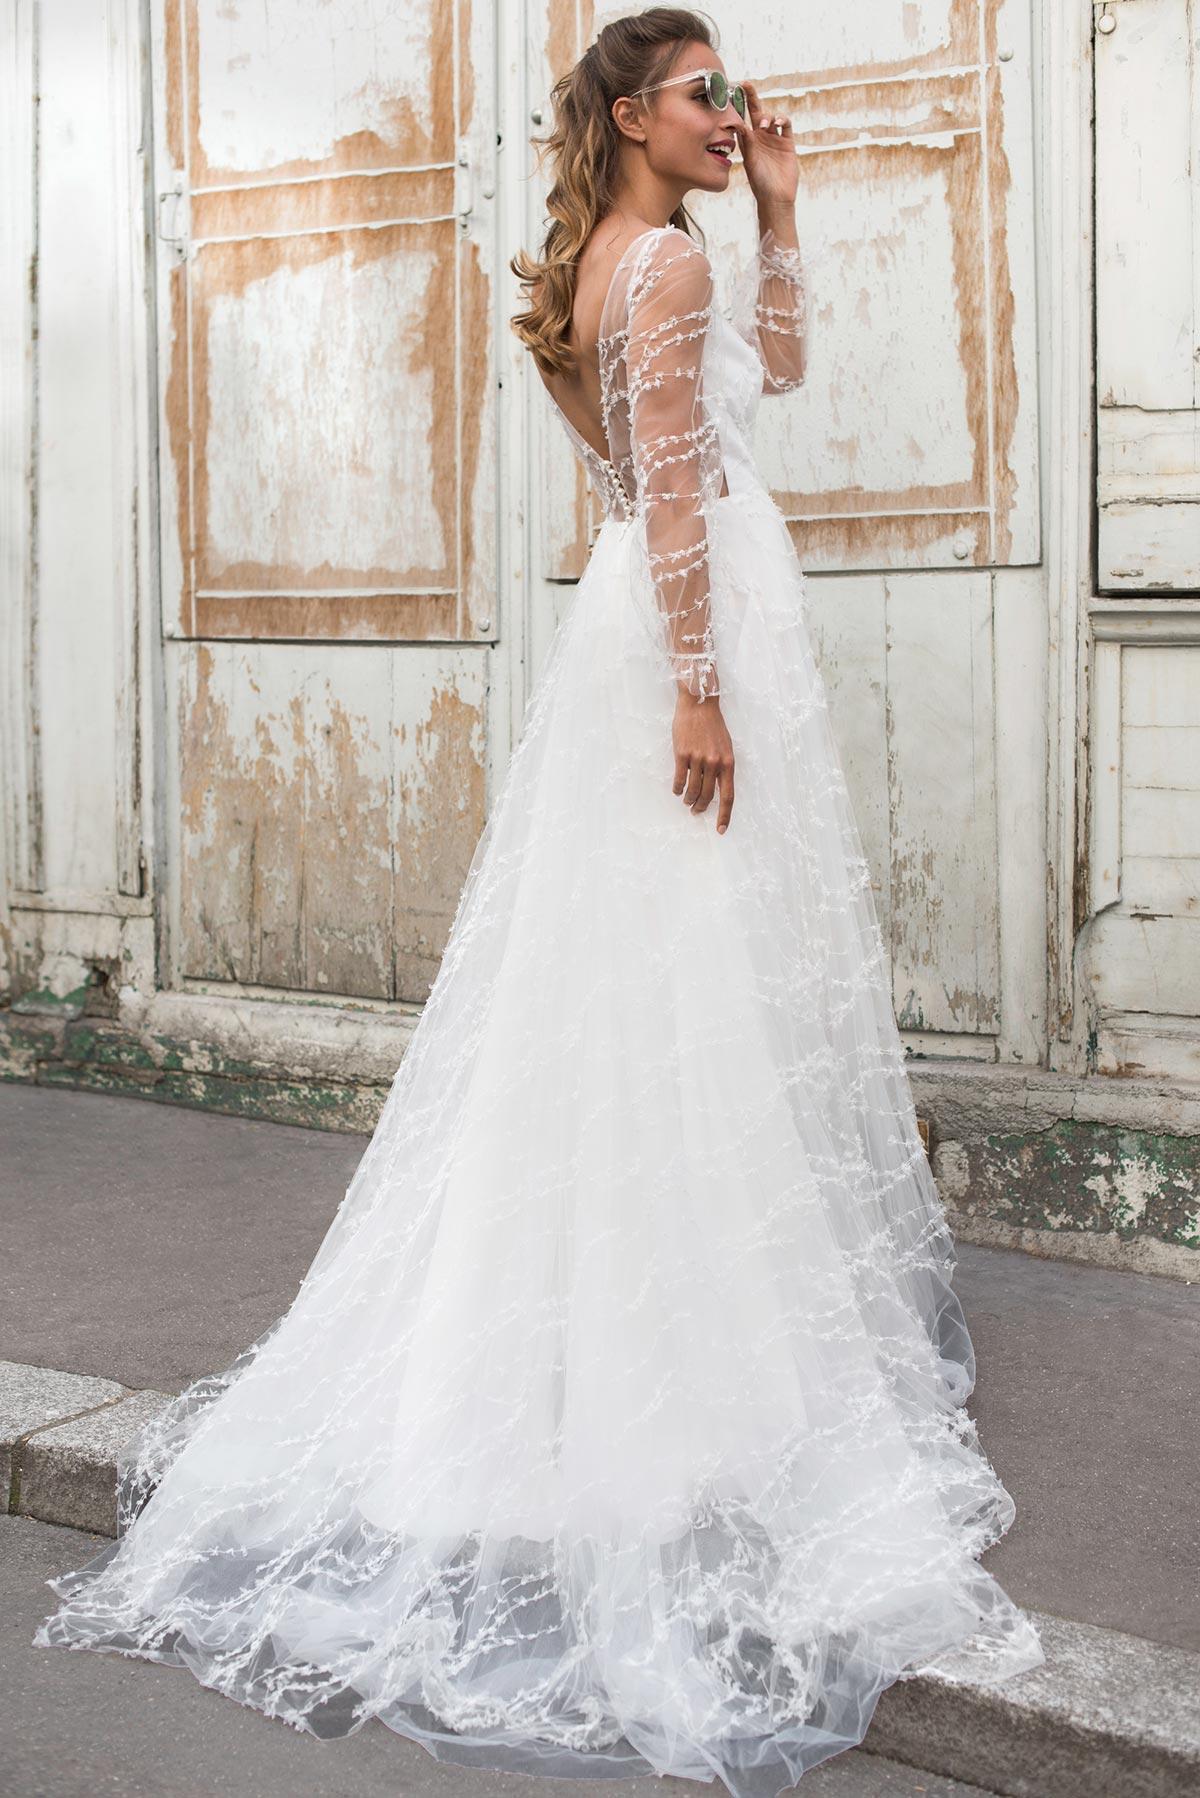 Creatrice robe de mariee clermont ferrand